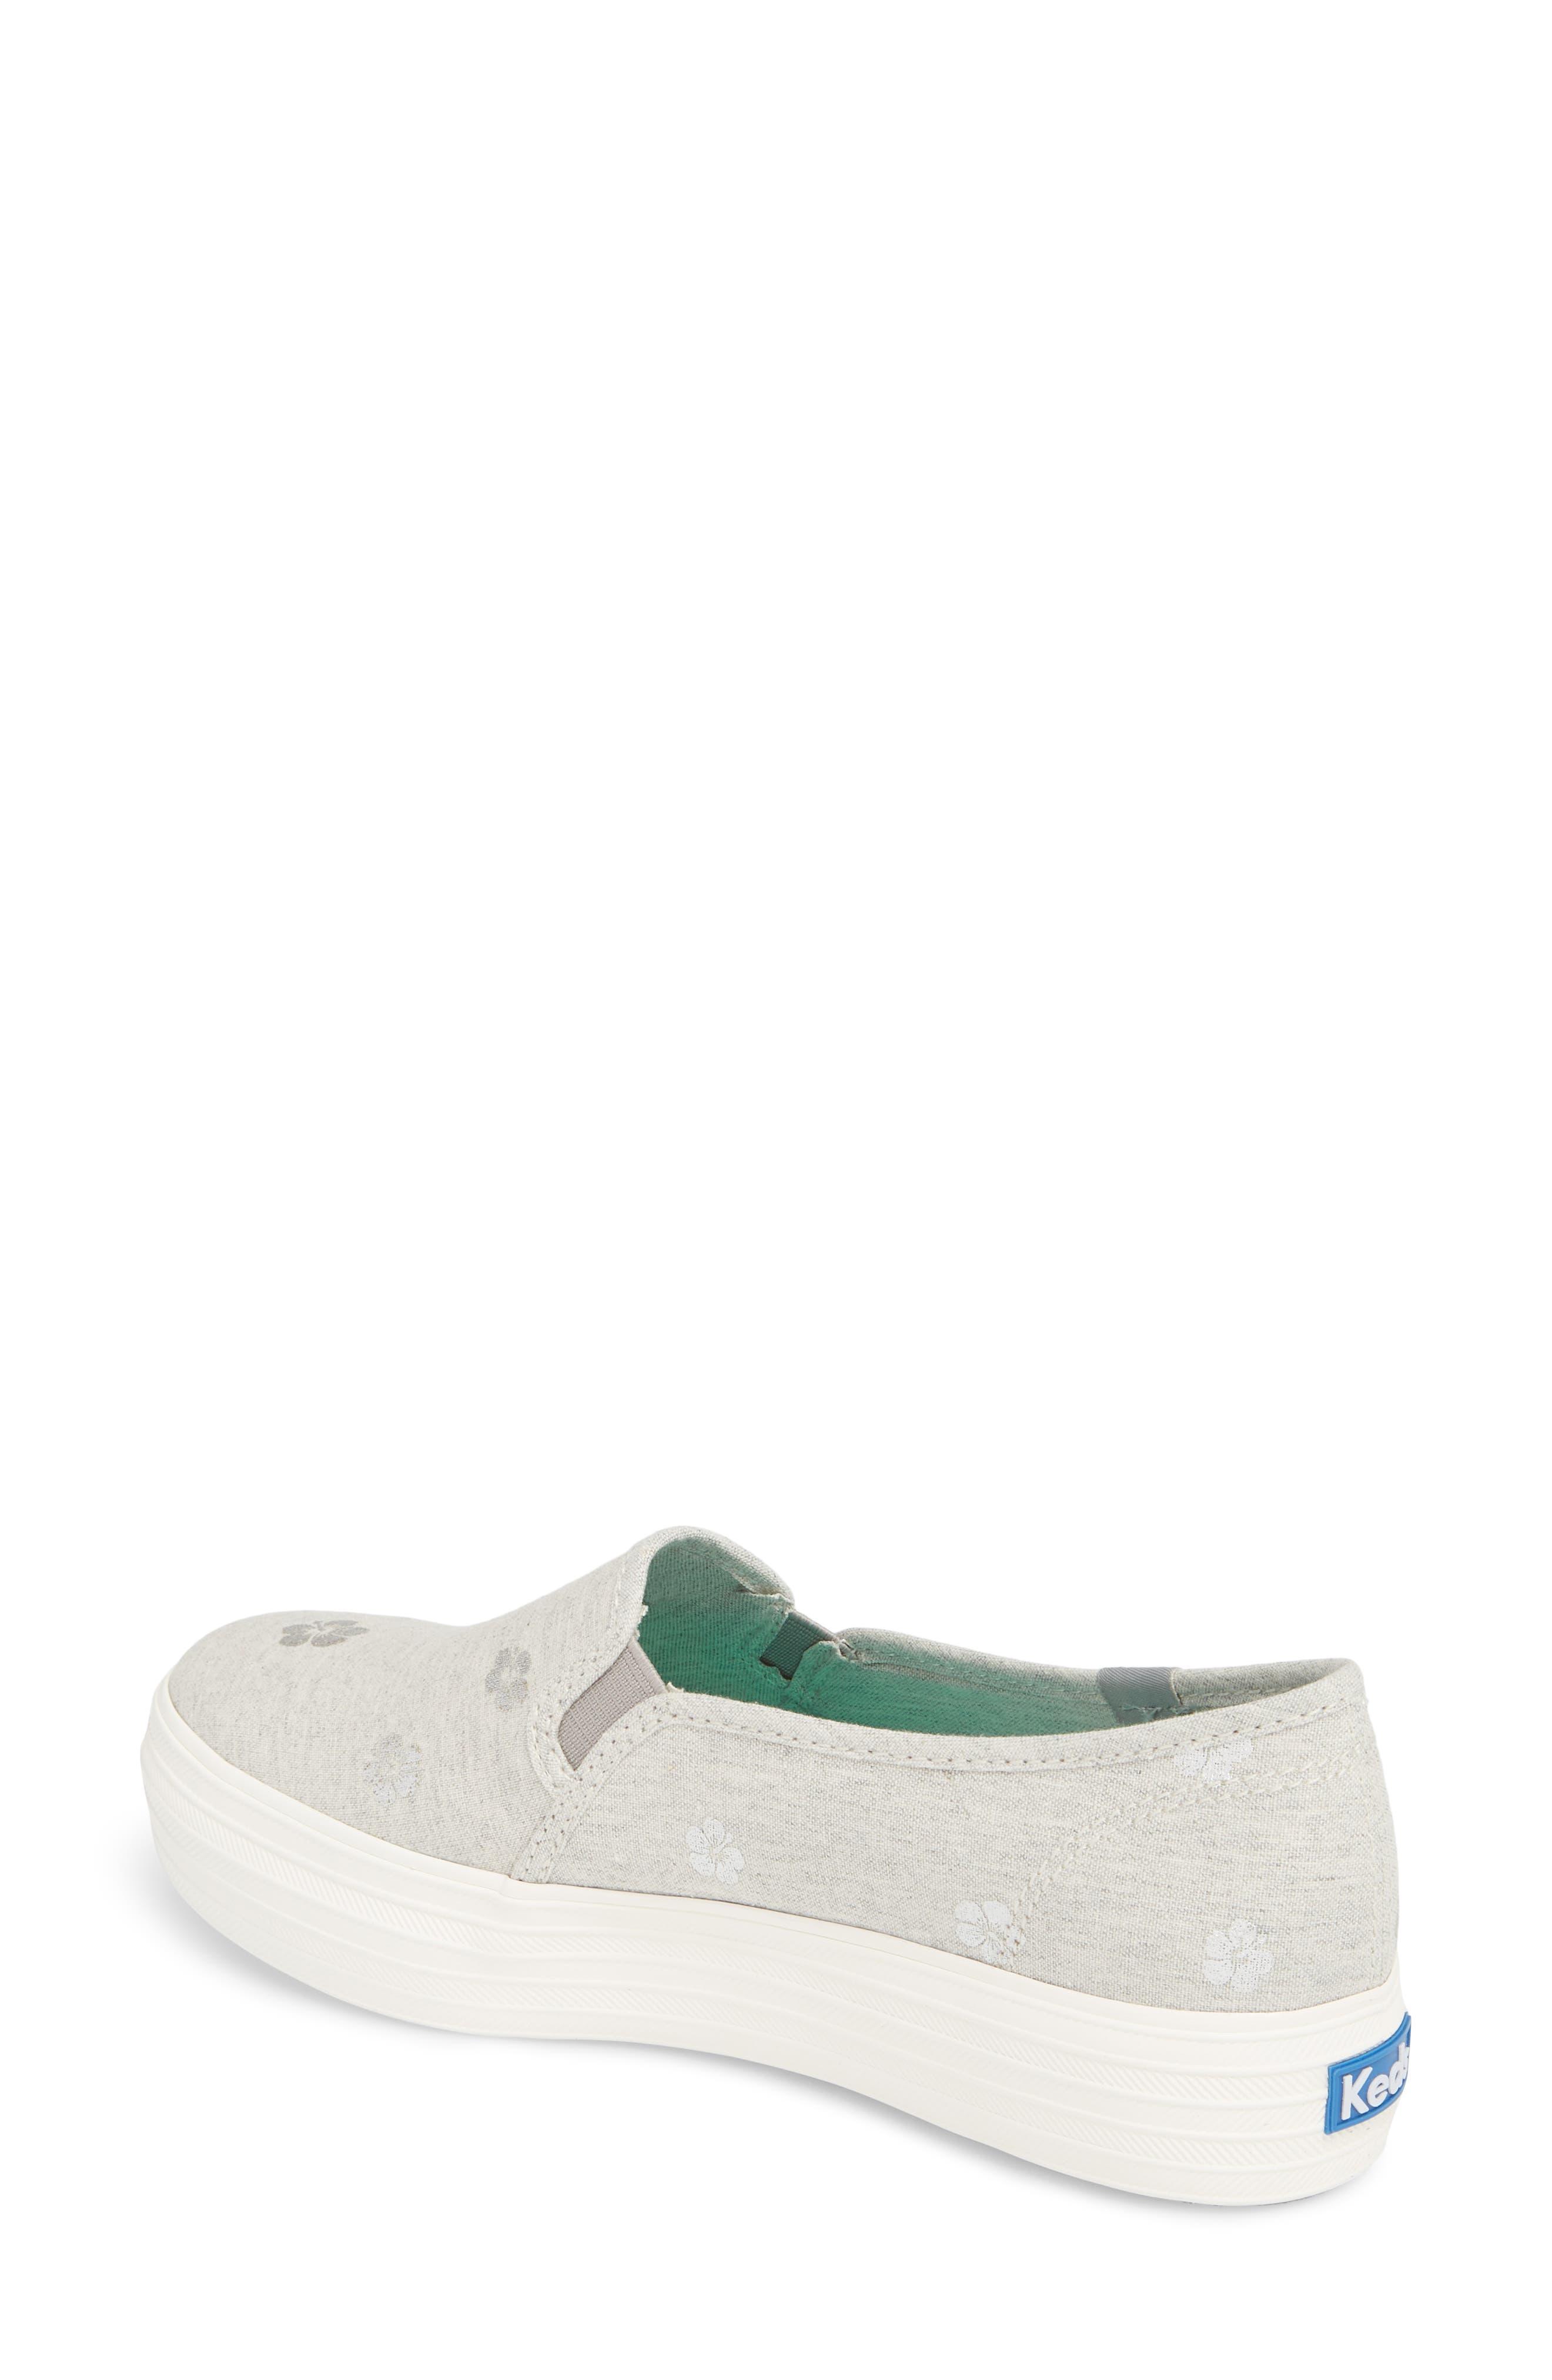 Triple Decker Hibiscus Slip-On Platform Sneaker,                             Alternate thumbnail 2, color,                             050